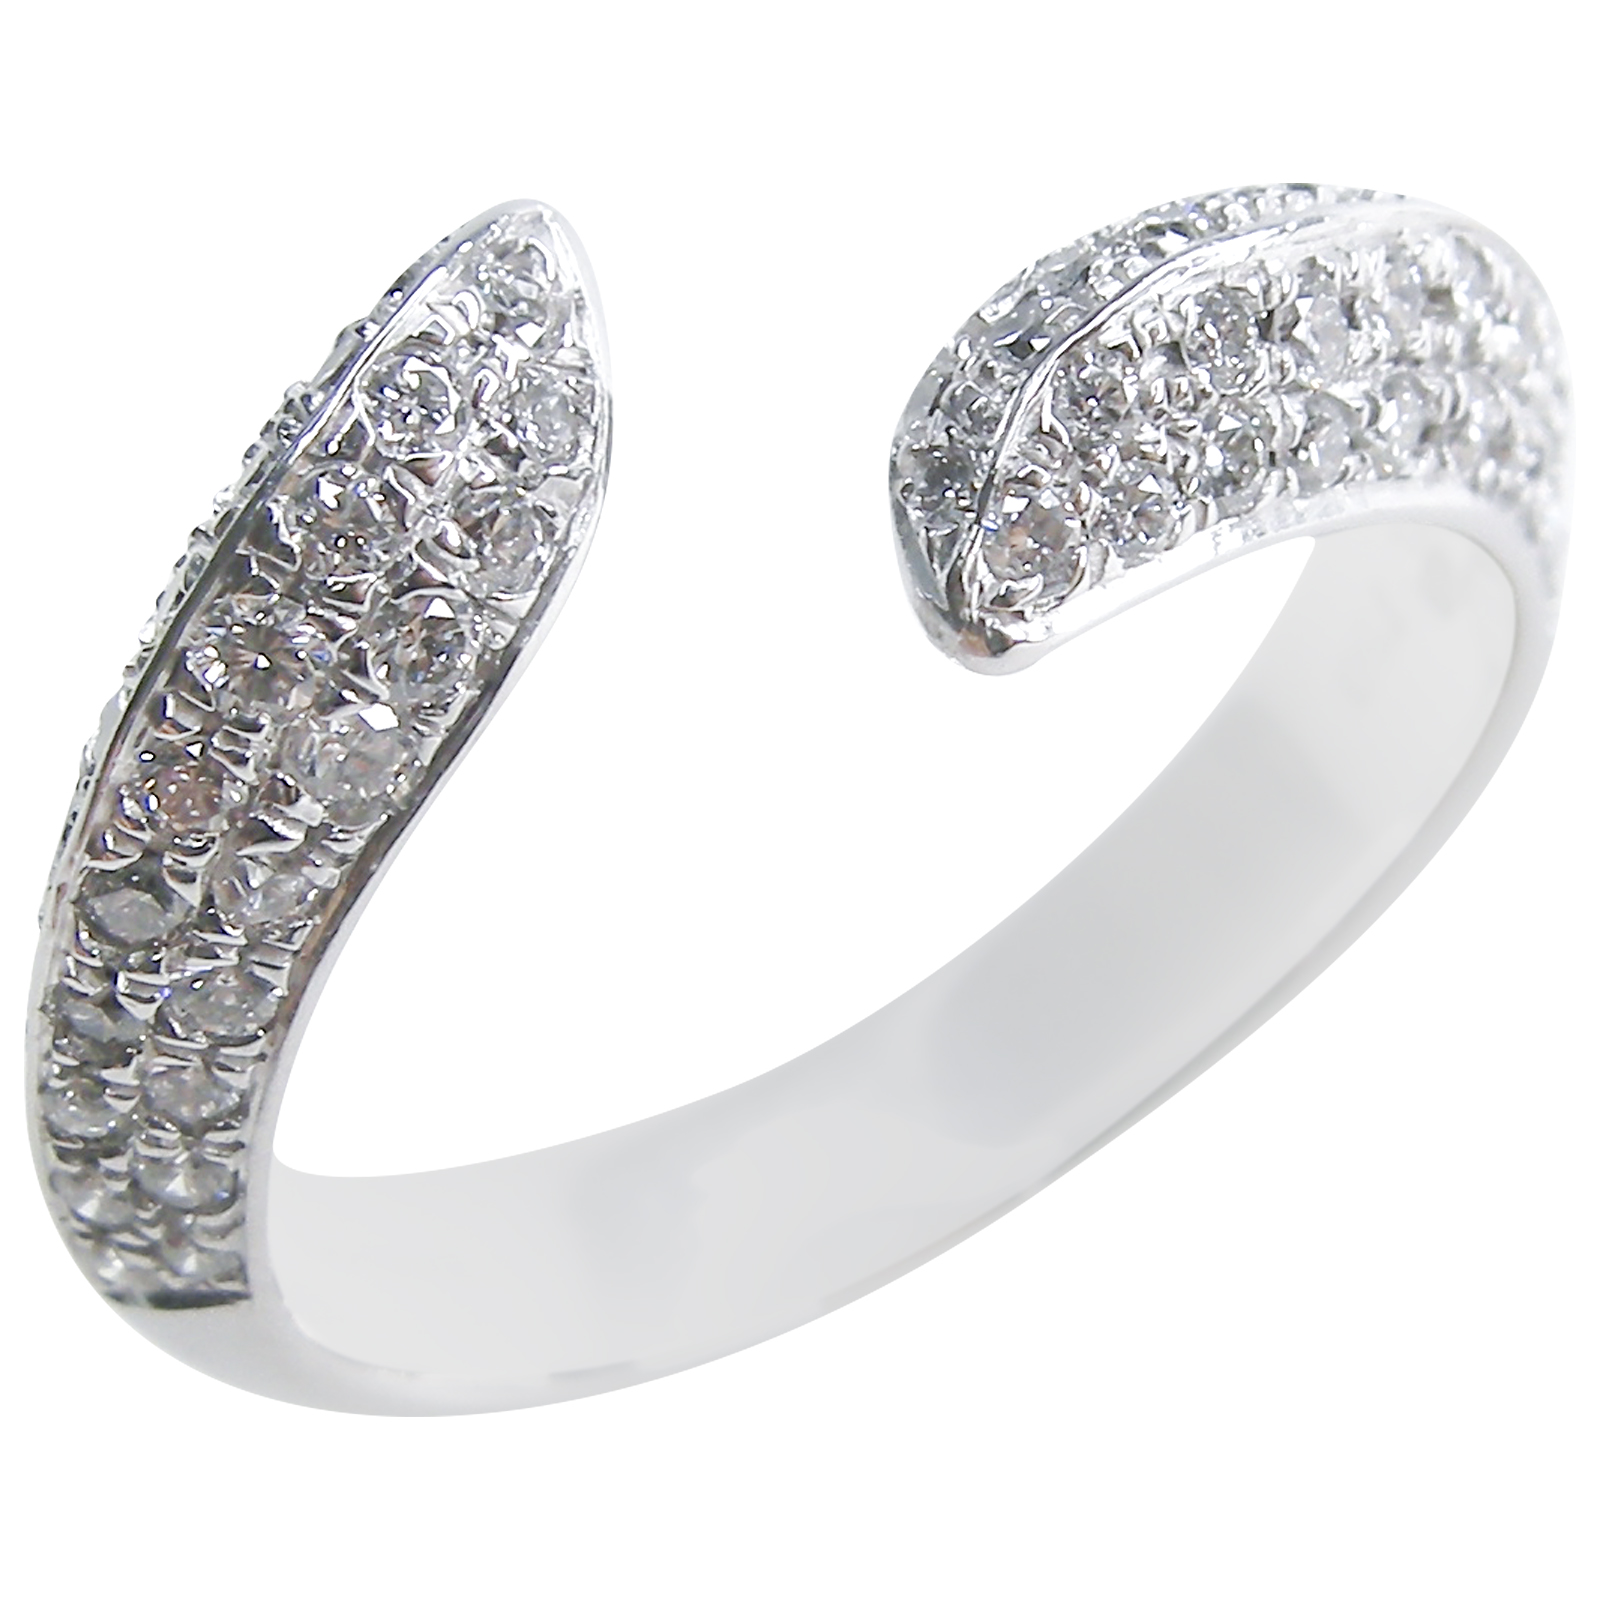 DIAMOND WAVE RING BESPOKE FINE JEWELLERY BY SHAHINA HATTA